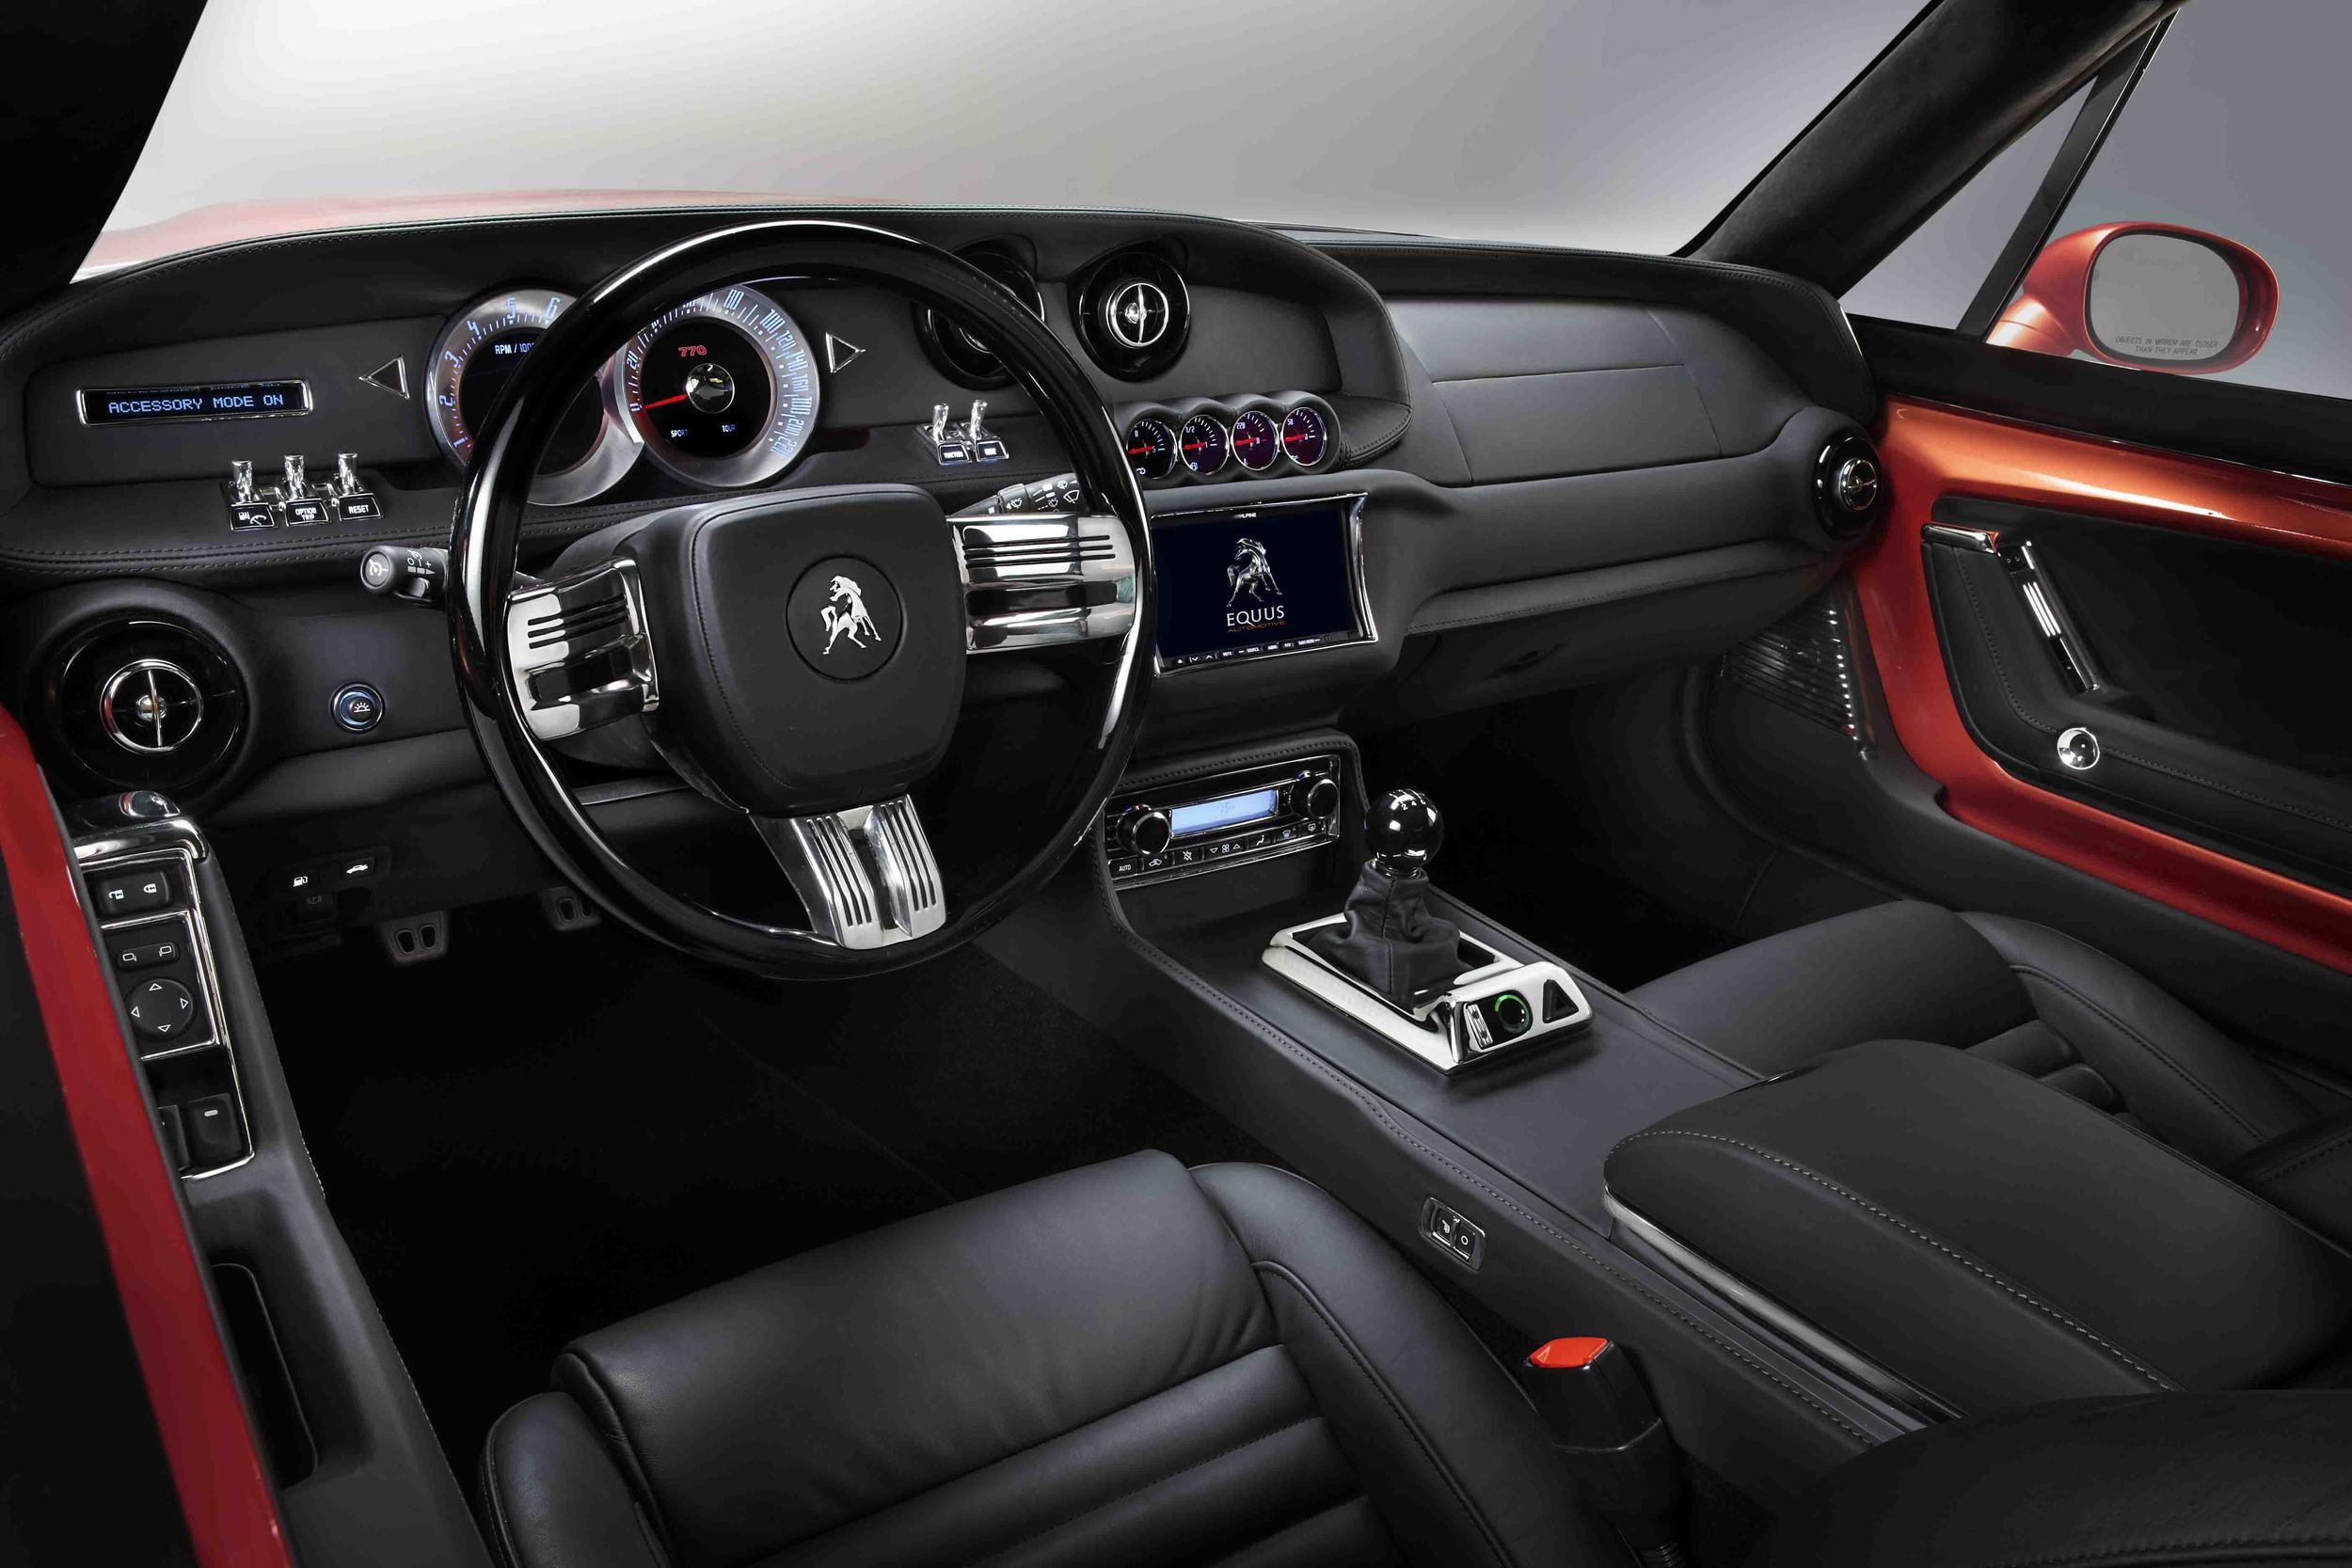 "EQUUS PRESS 10 img alt=""equus bass 770 interior"".jpg"